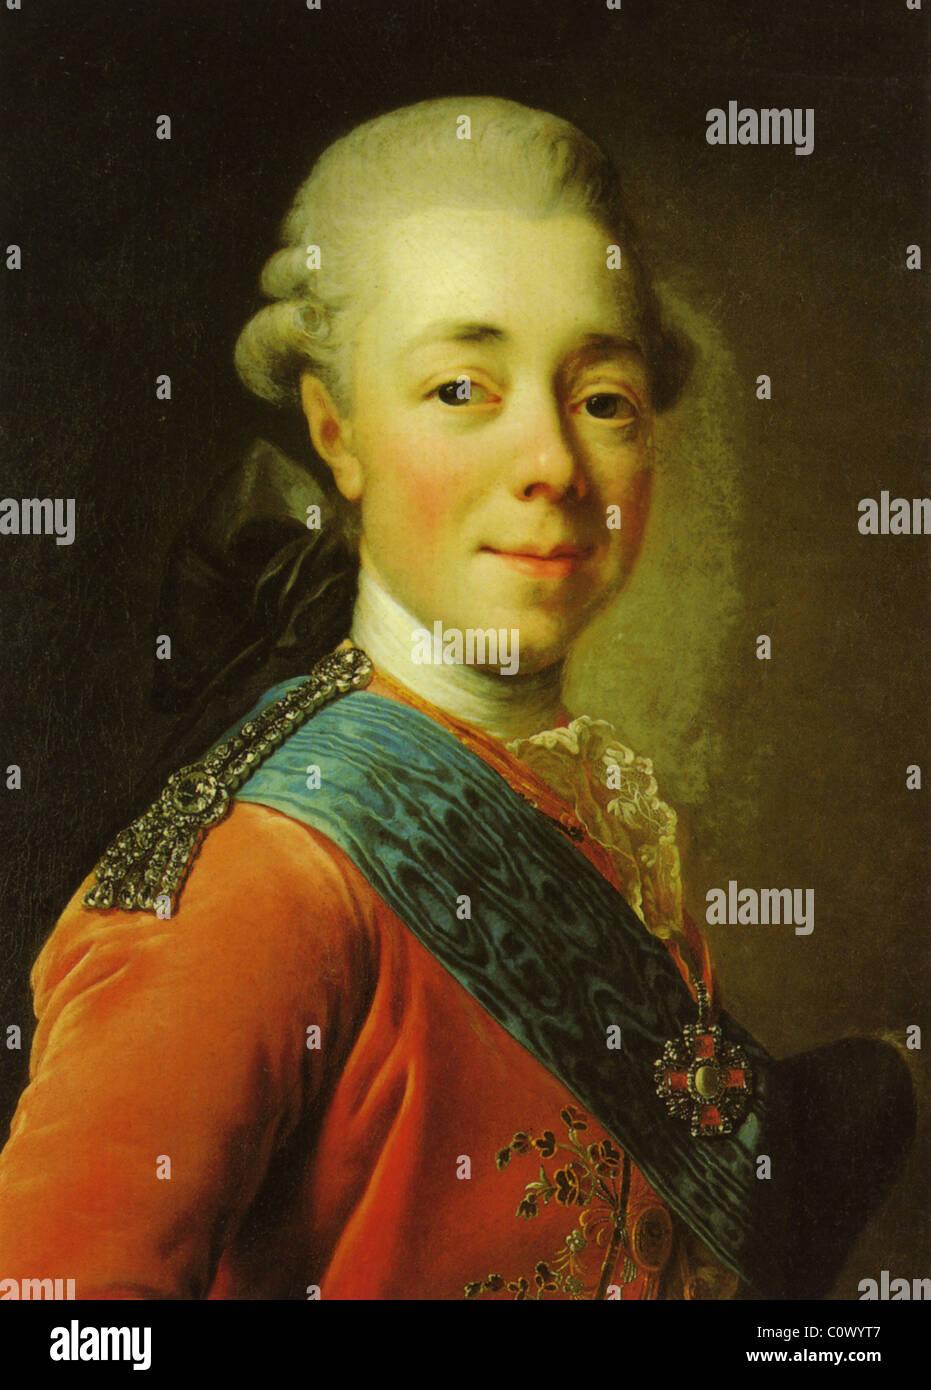 EMPEROR PAUL I OF RUSSIA  (1754-1801) - Stock Image